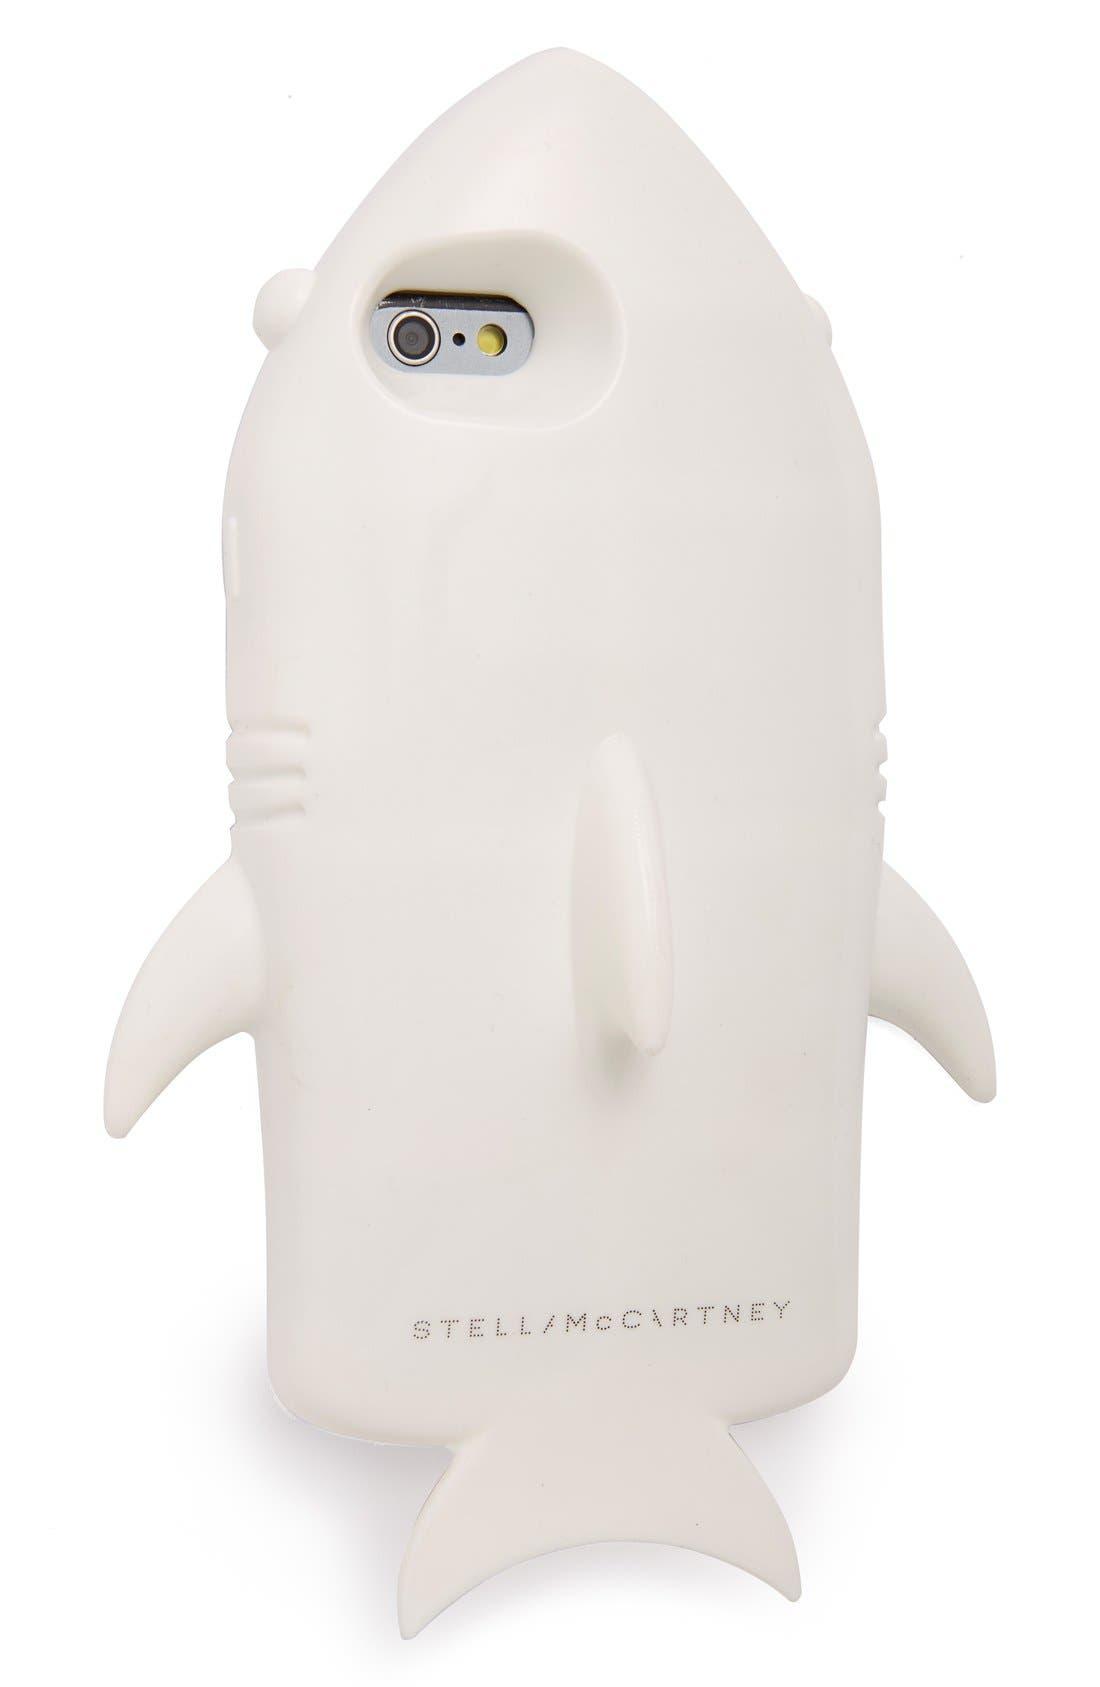 Main Image - Stella McCartney 'Shark' iPhone 6 & 6s Case